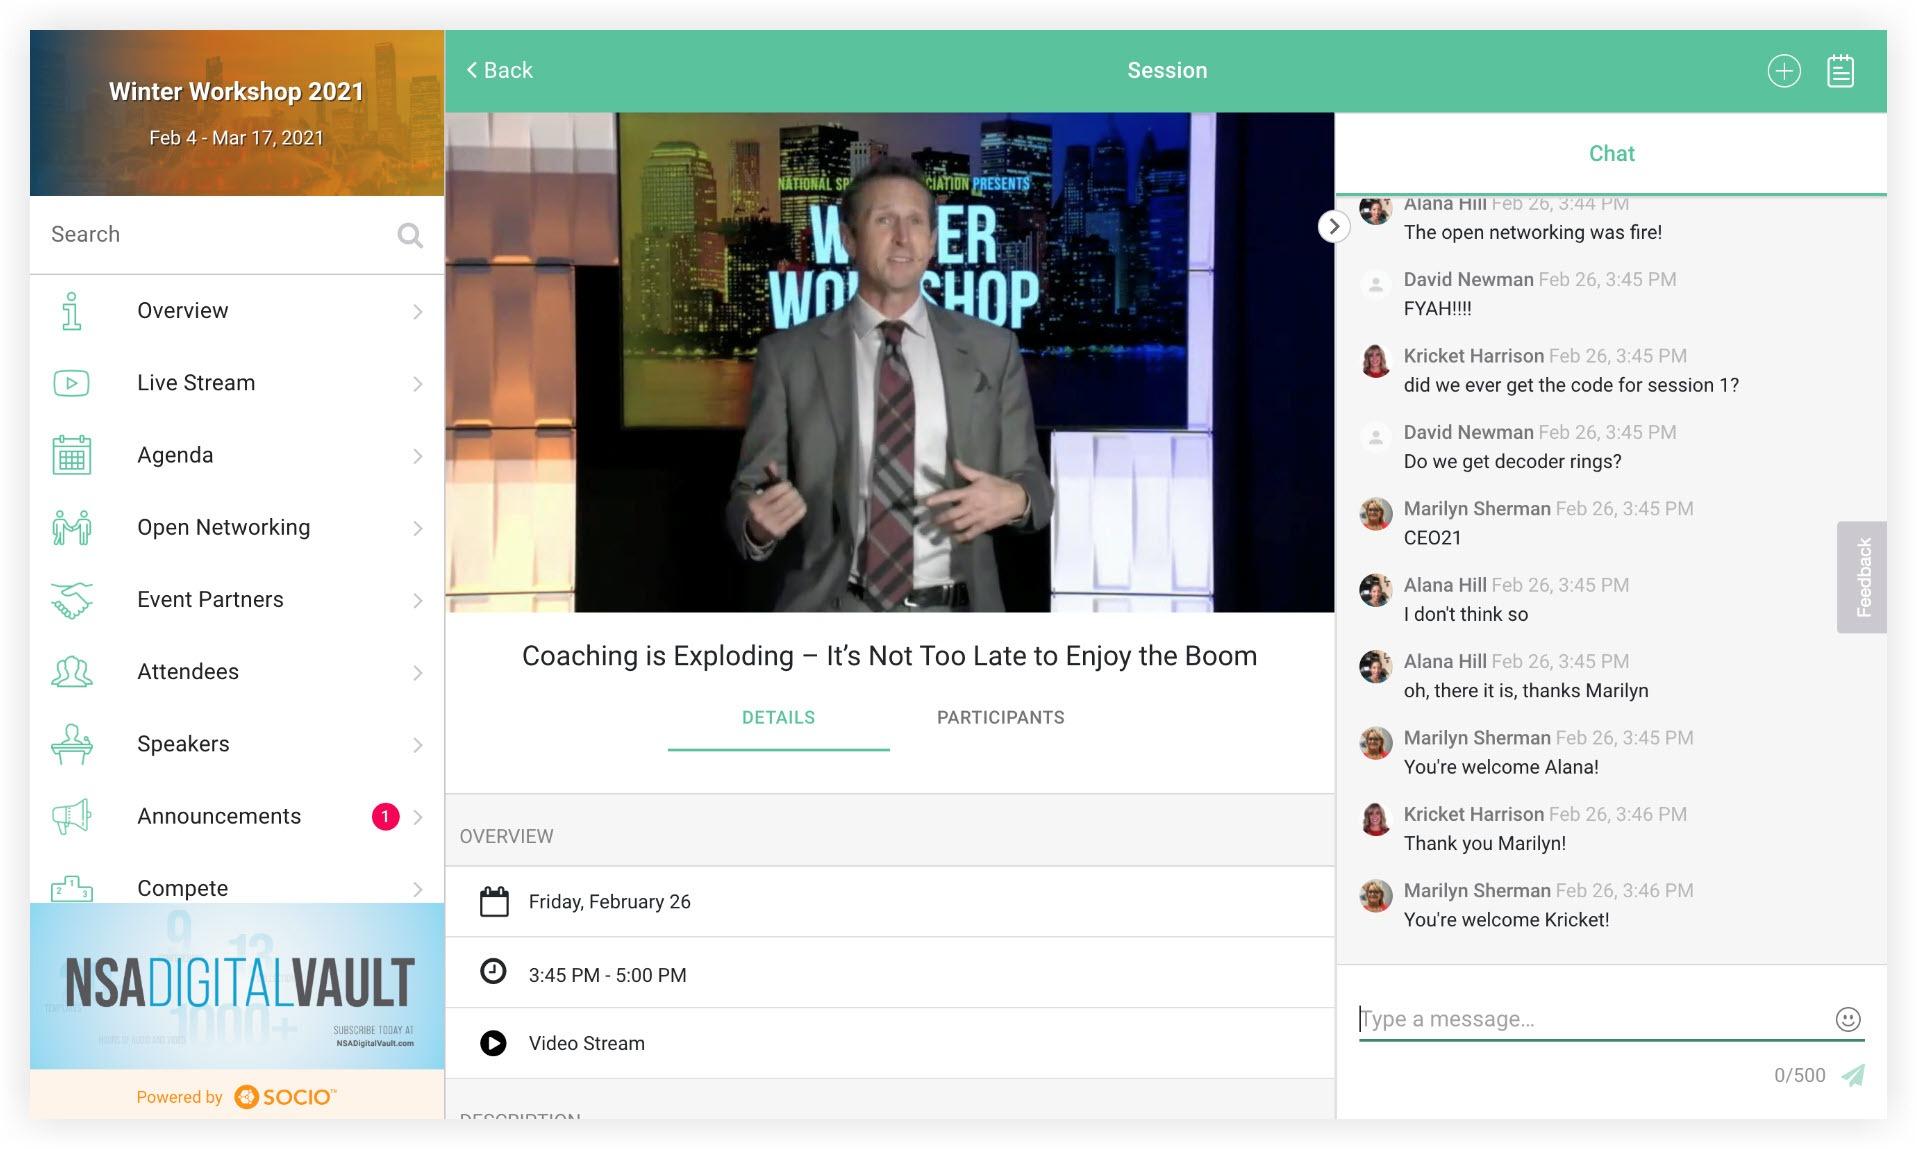 Screenshot of a live stream in an Agenda session.